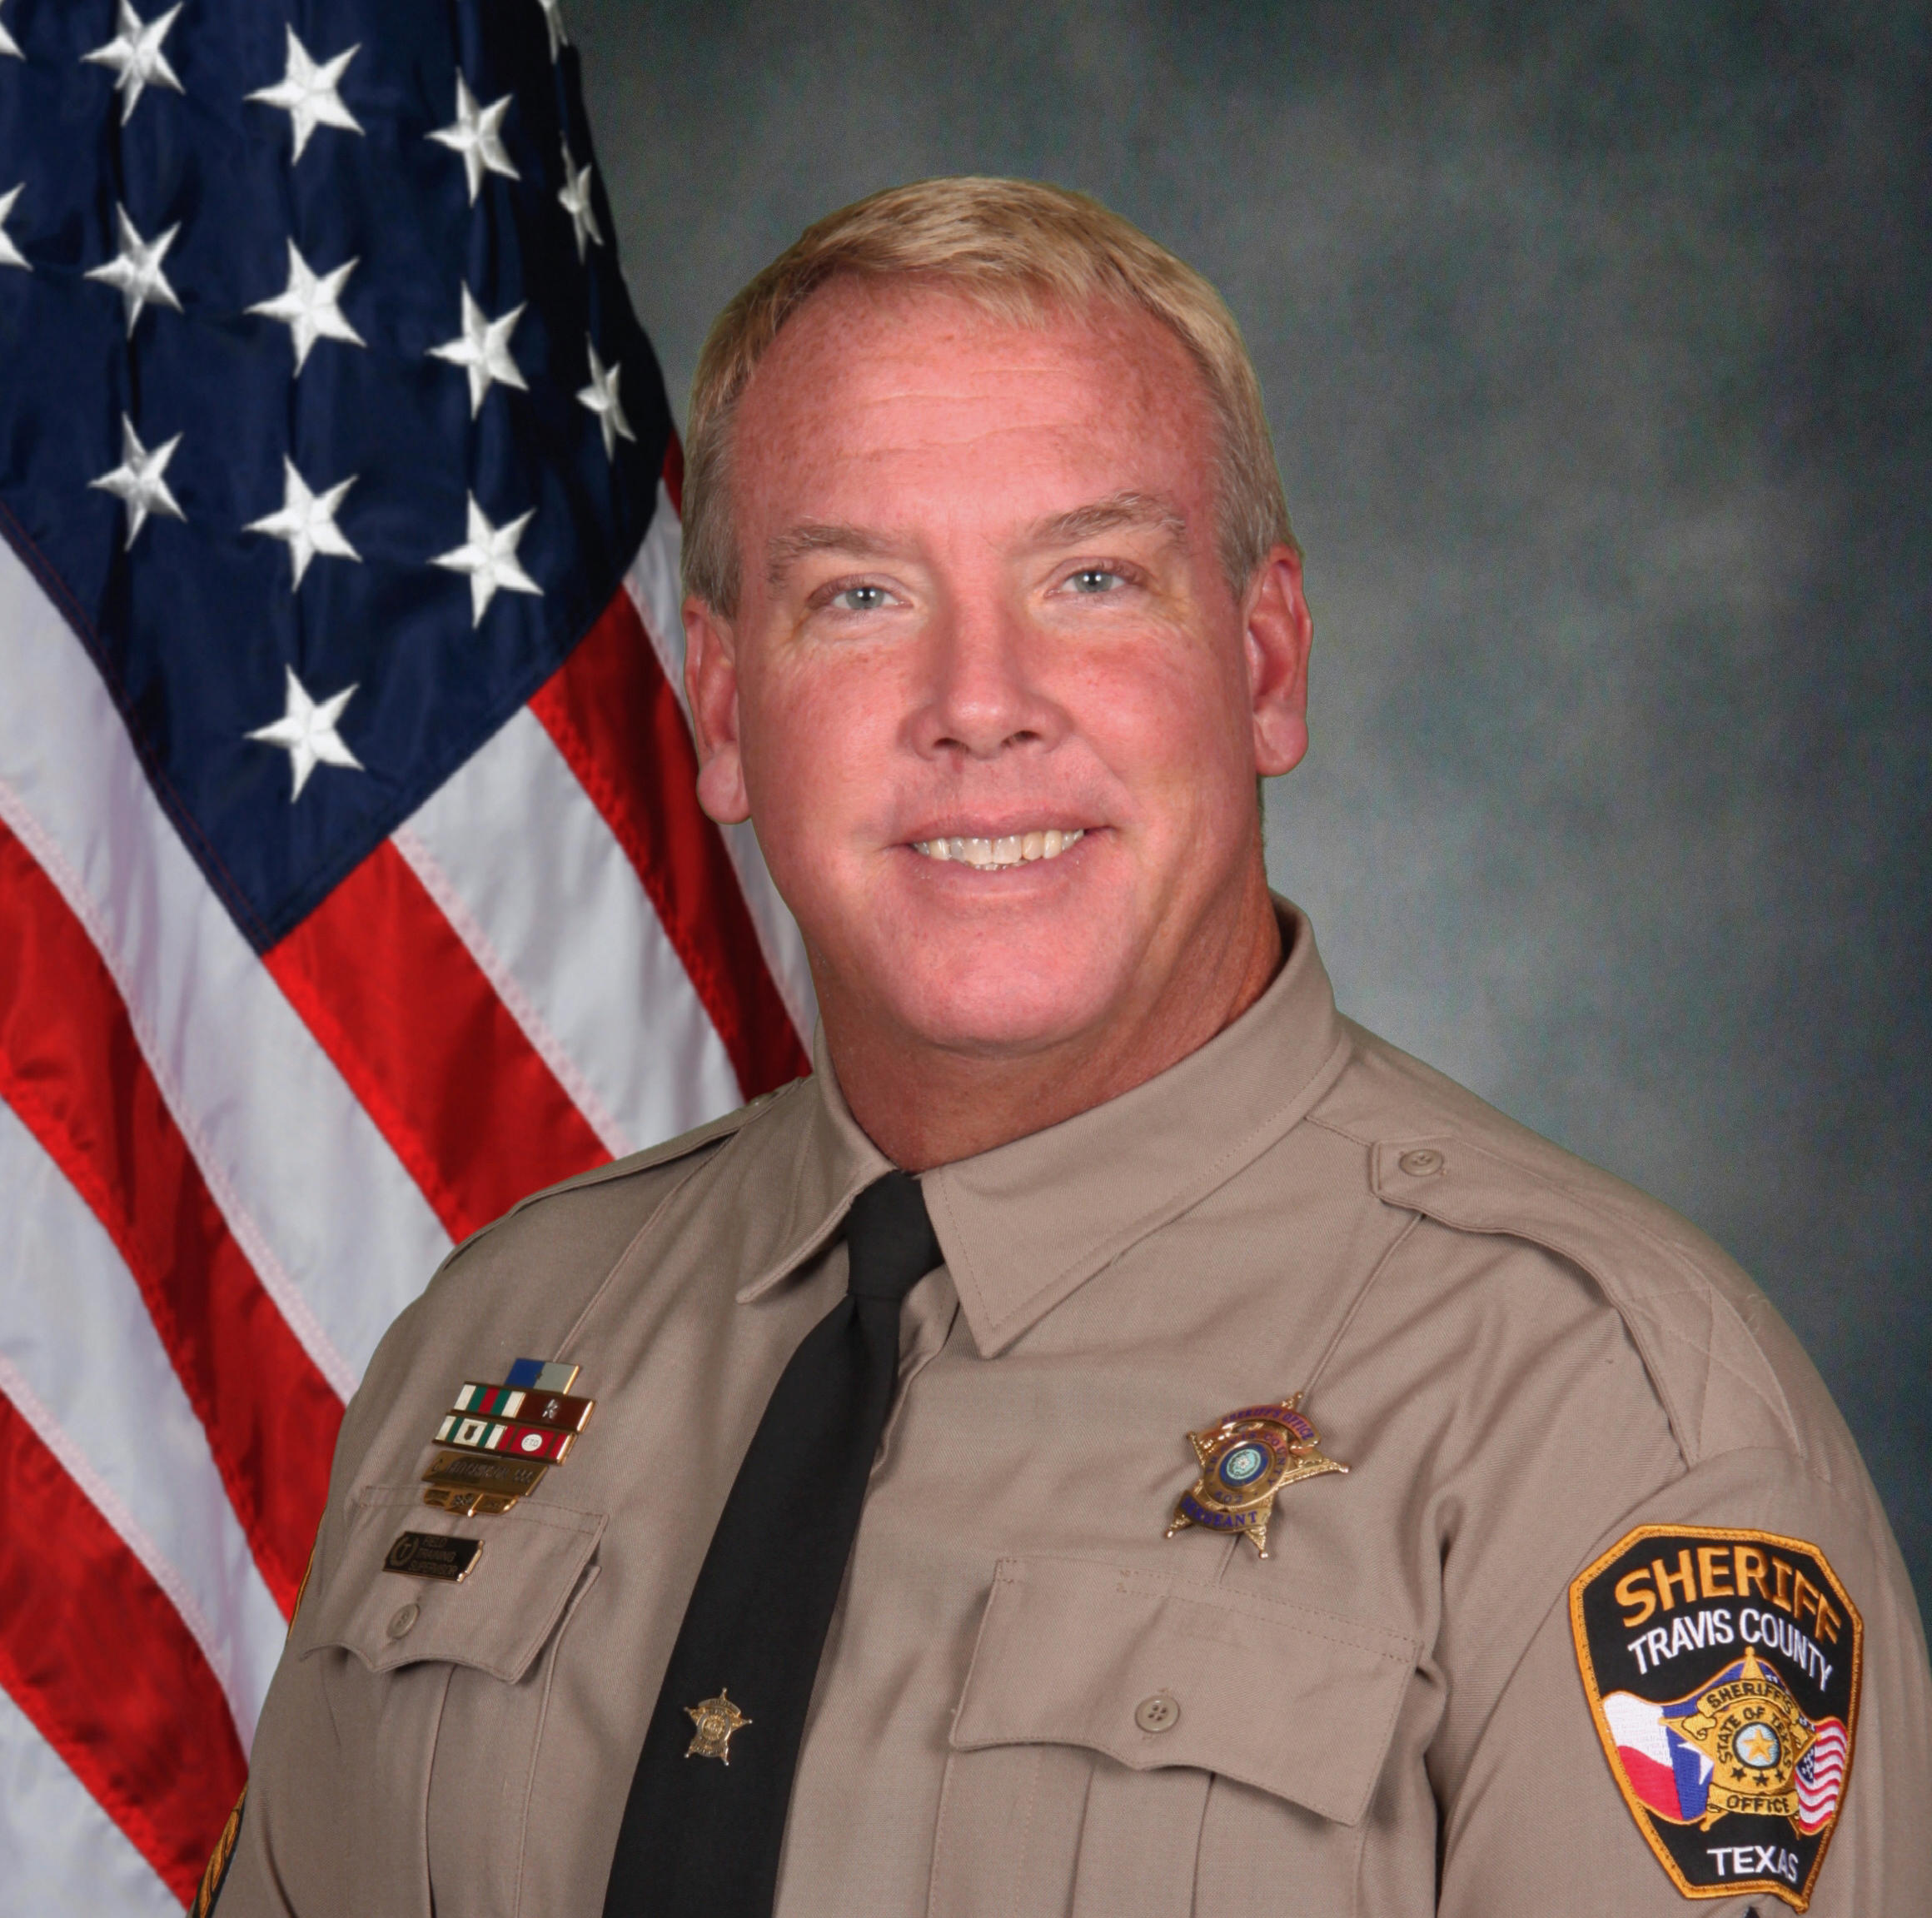 Death of Travis County Sheriff Deputy Ruled a Suicide | KUT